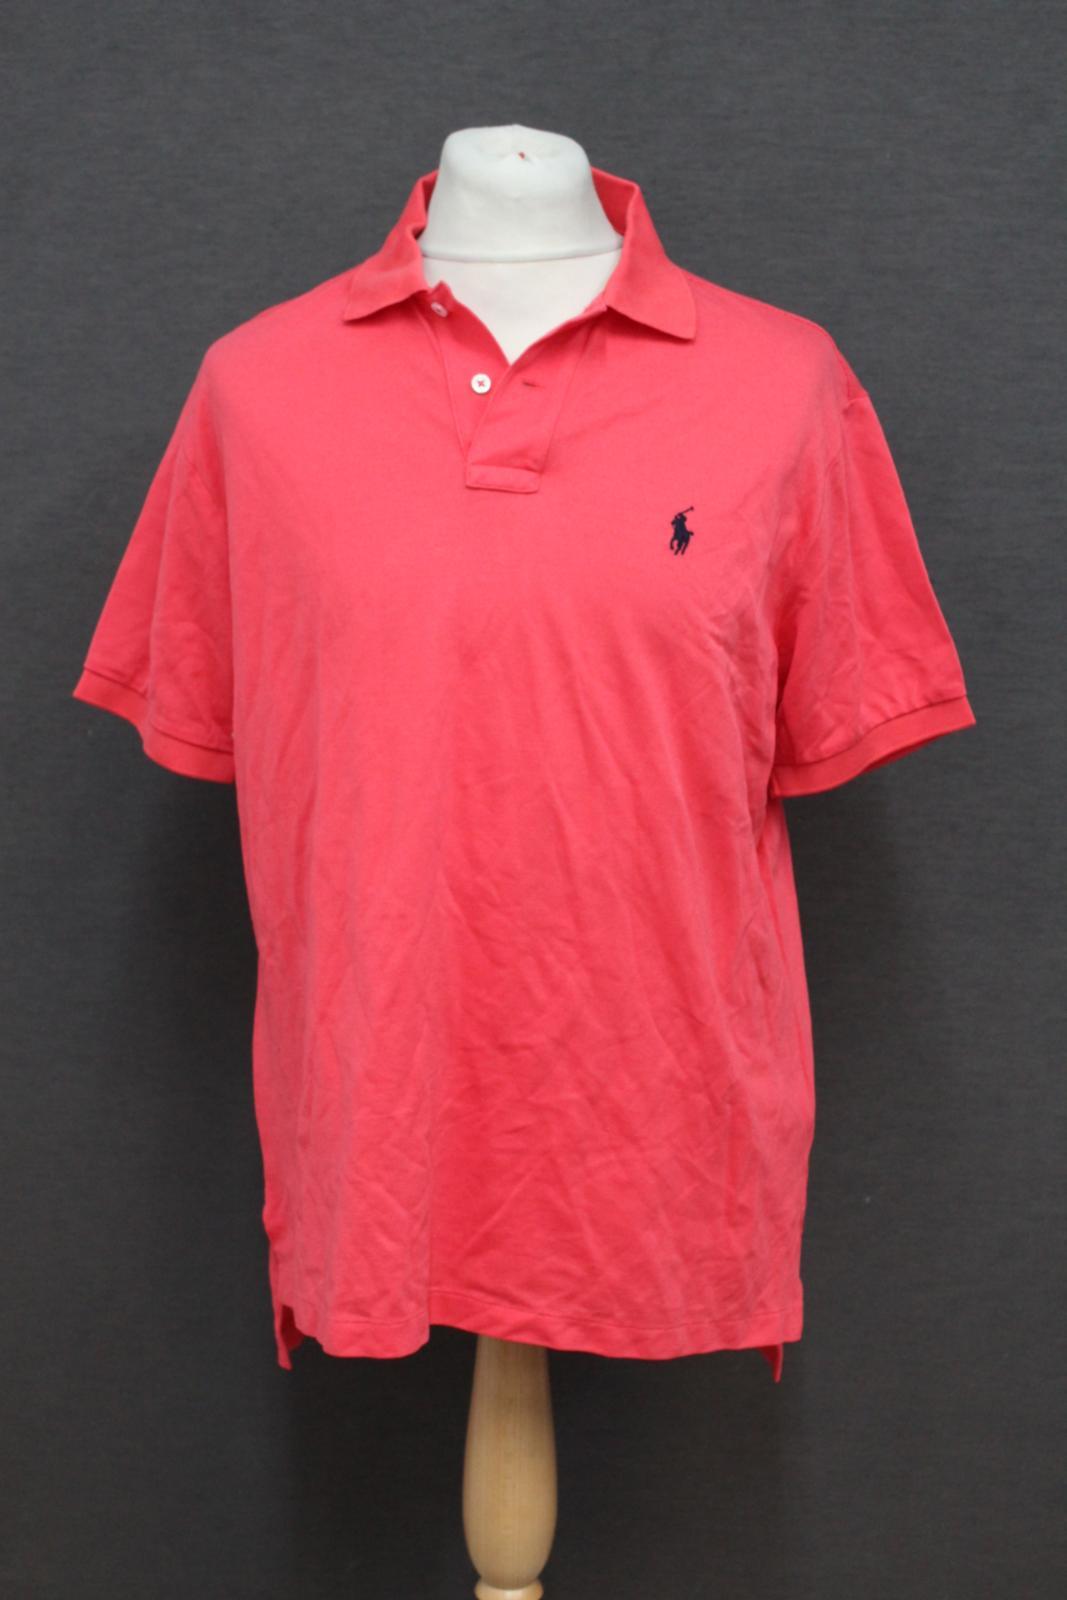 Ralph-Lauren-Polo-para-hombre-de-color-rosa-de-algodon-Manga-Corta-Camisa-Polo-De-Ajuste miniatura 2